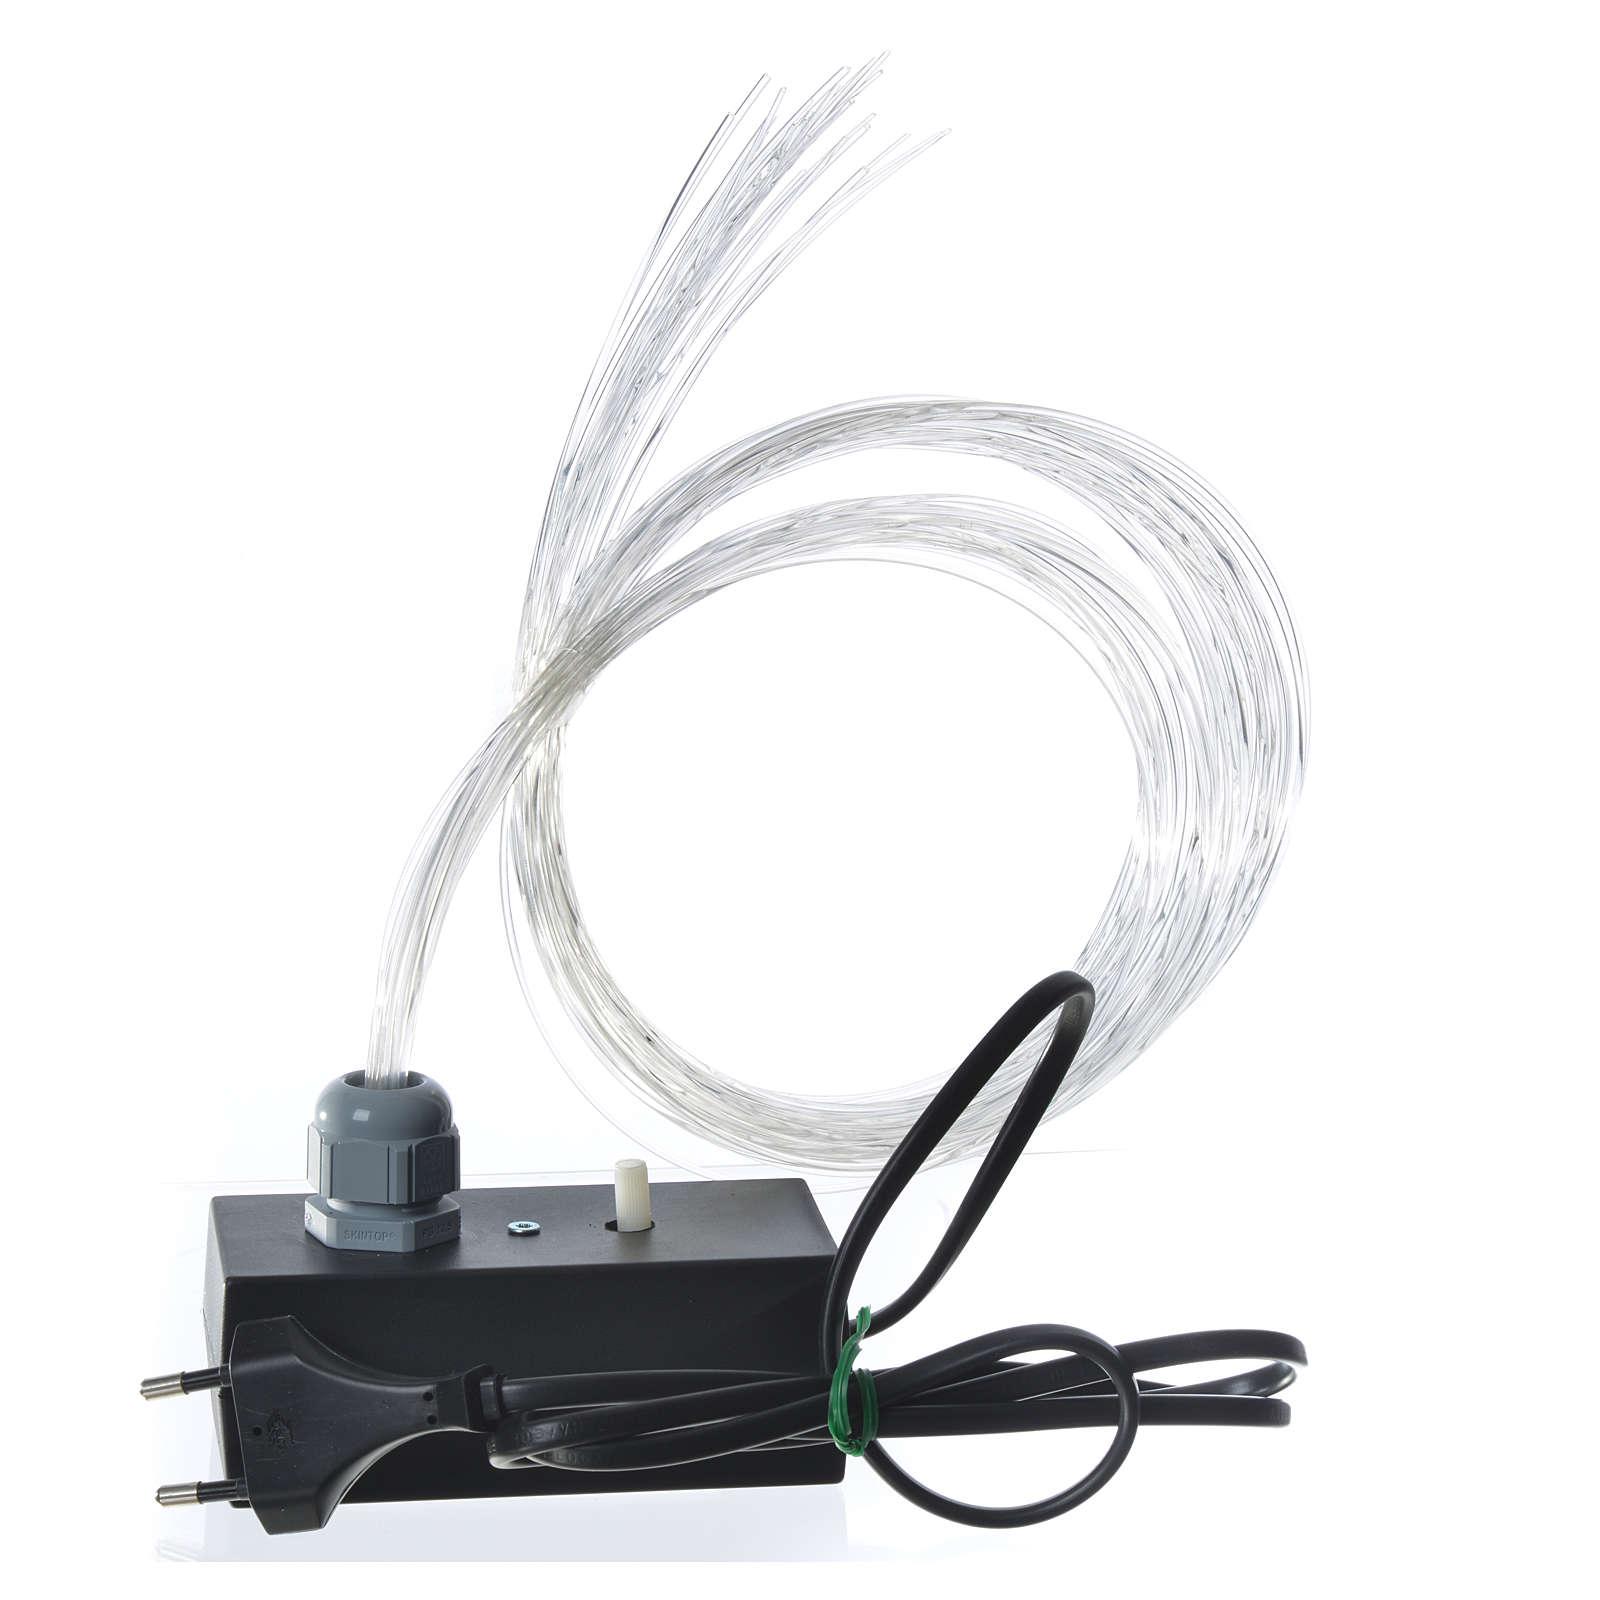 Fibra ottica 1m presepe illuminatore led dissolvenza tremolio 4